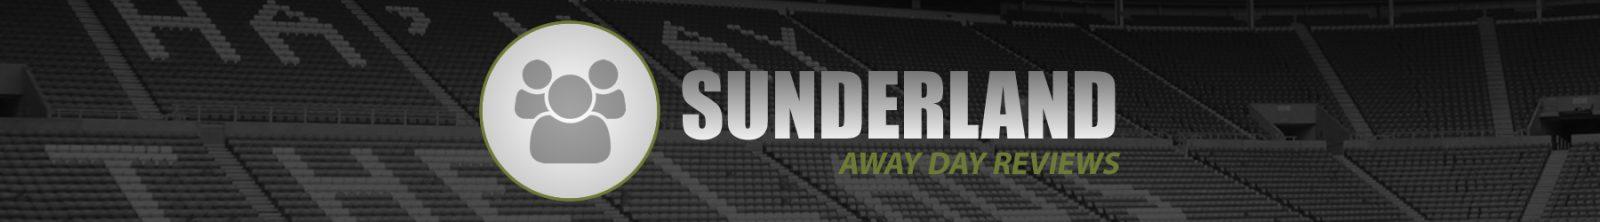 Review Sunderland